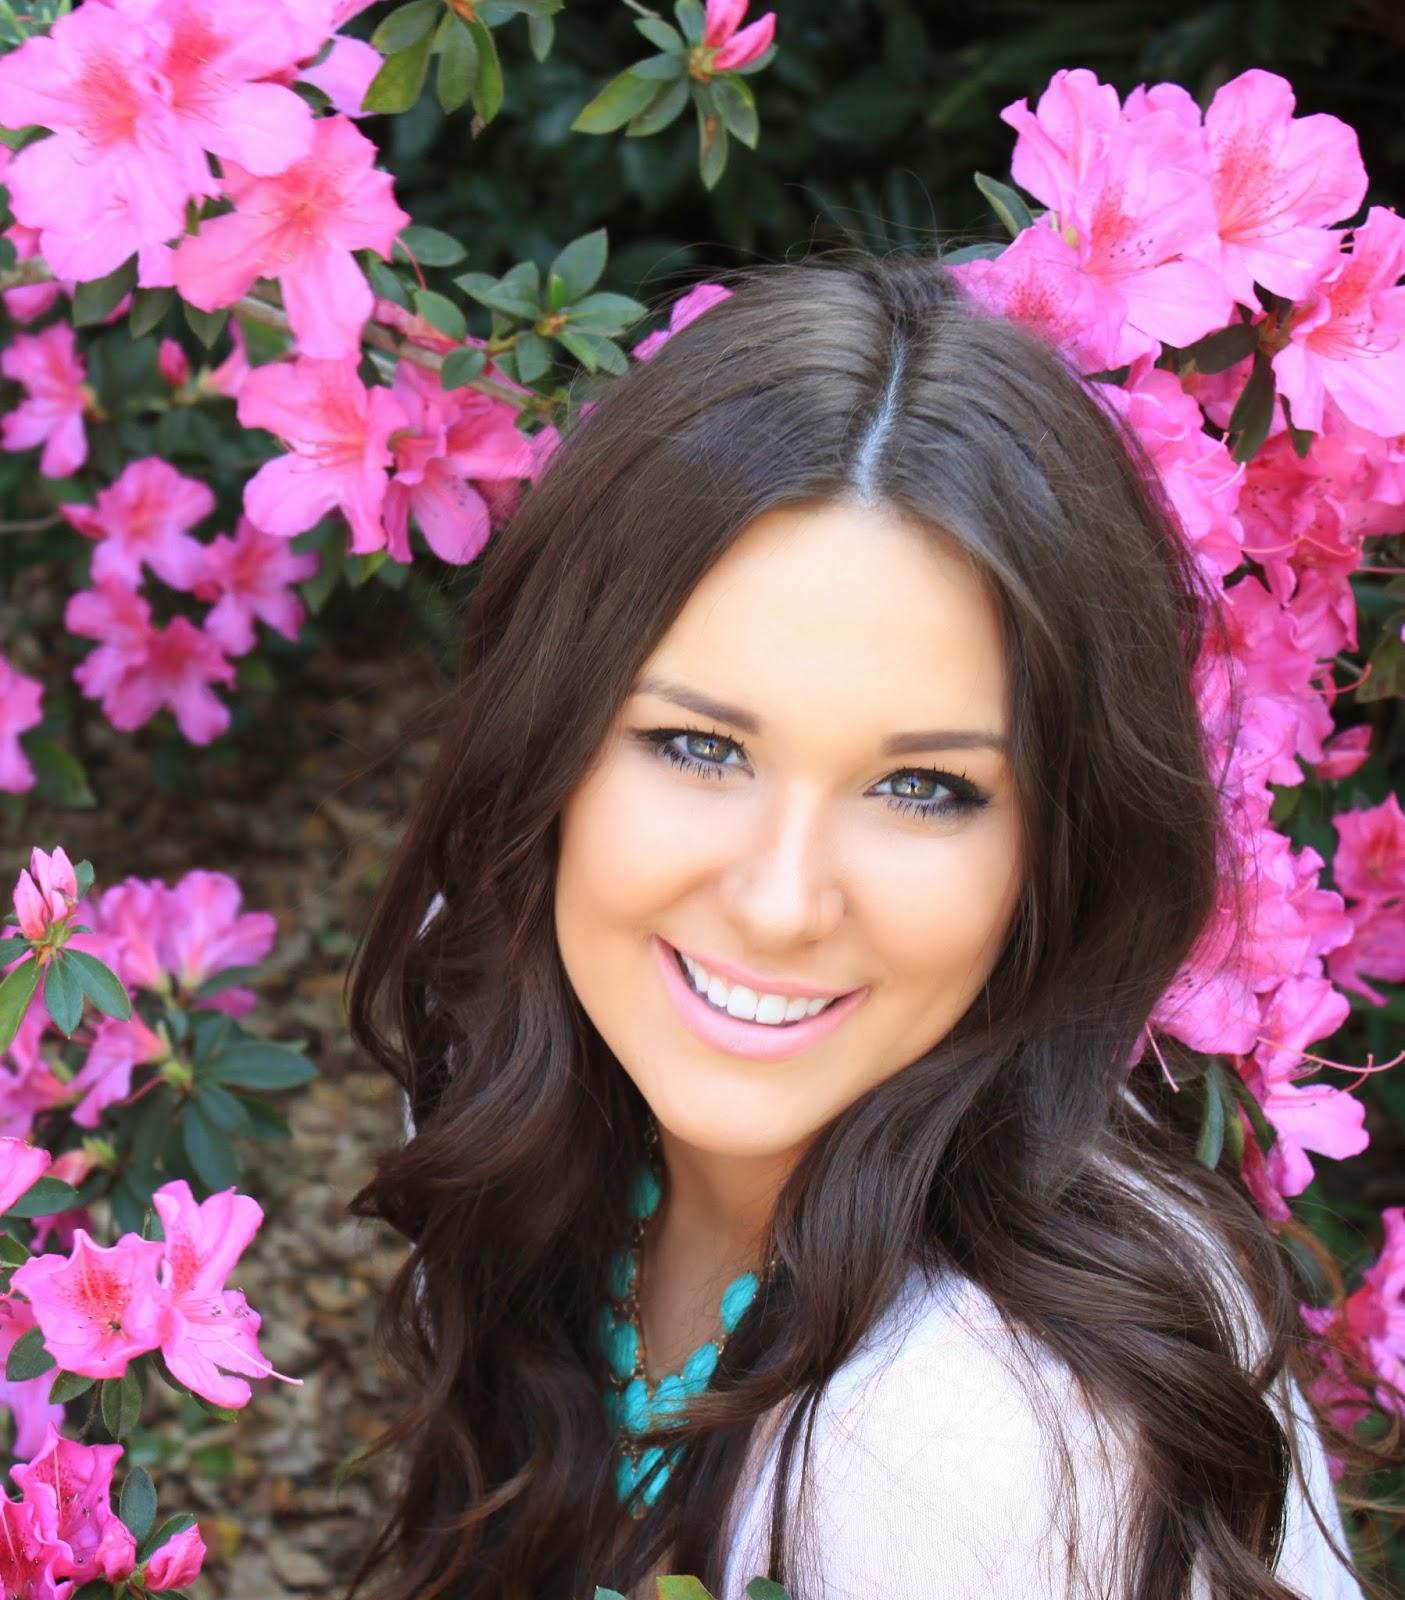 Beauty Blogger Mash Elle wearing MAC's Please Me lipstick